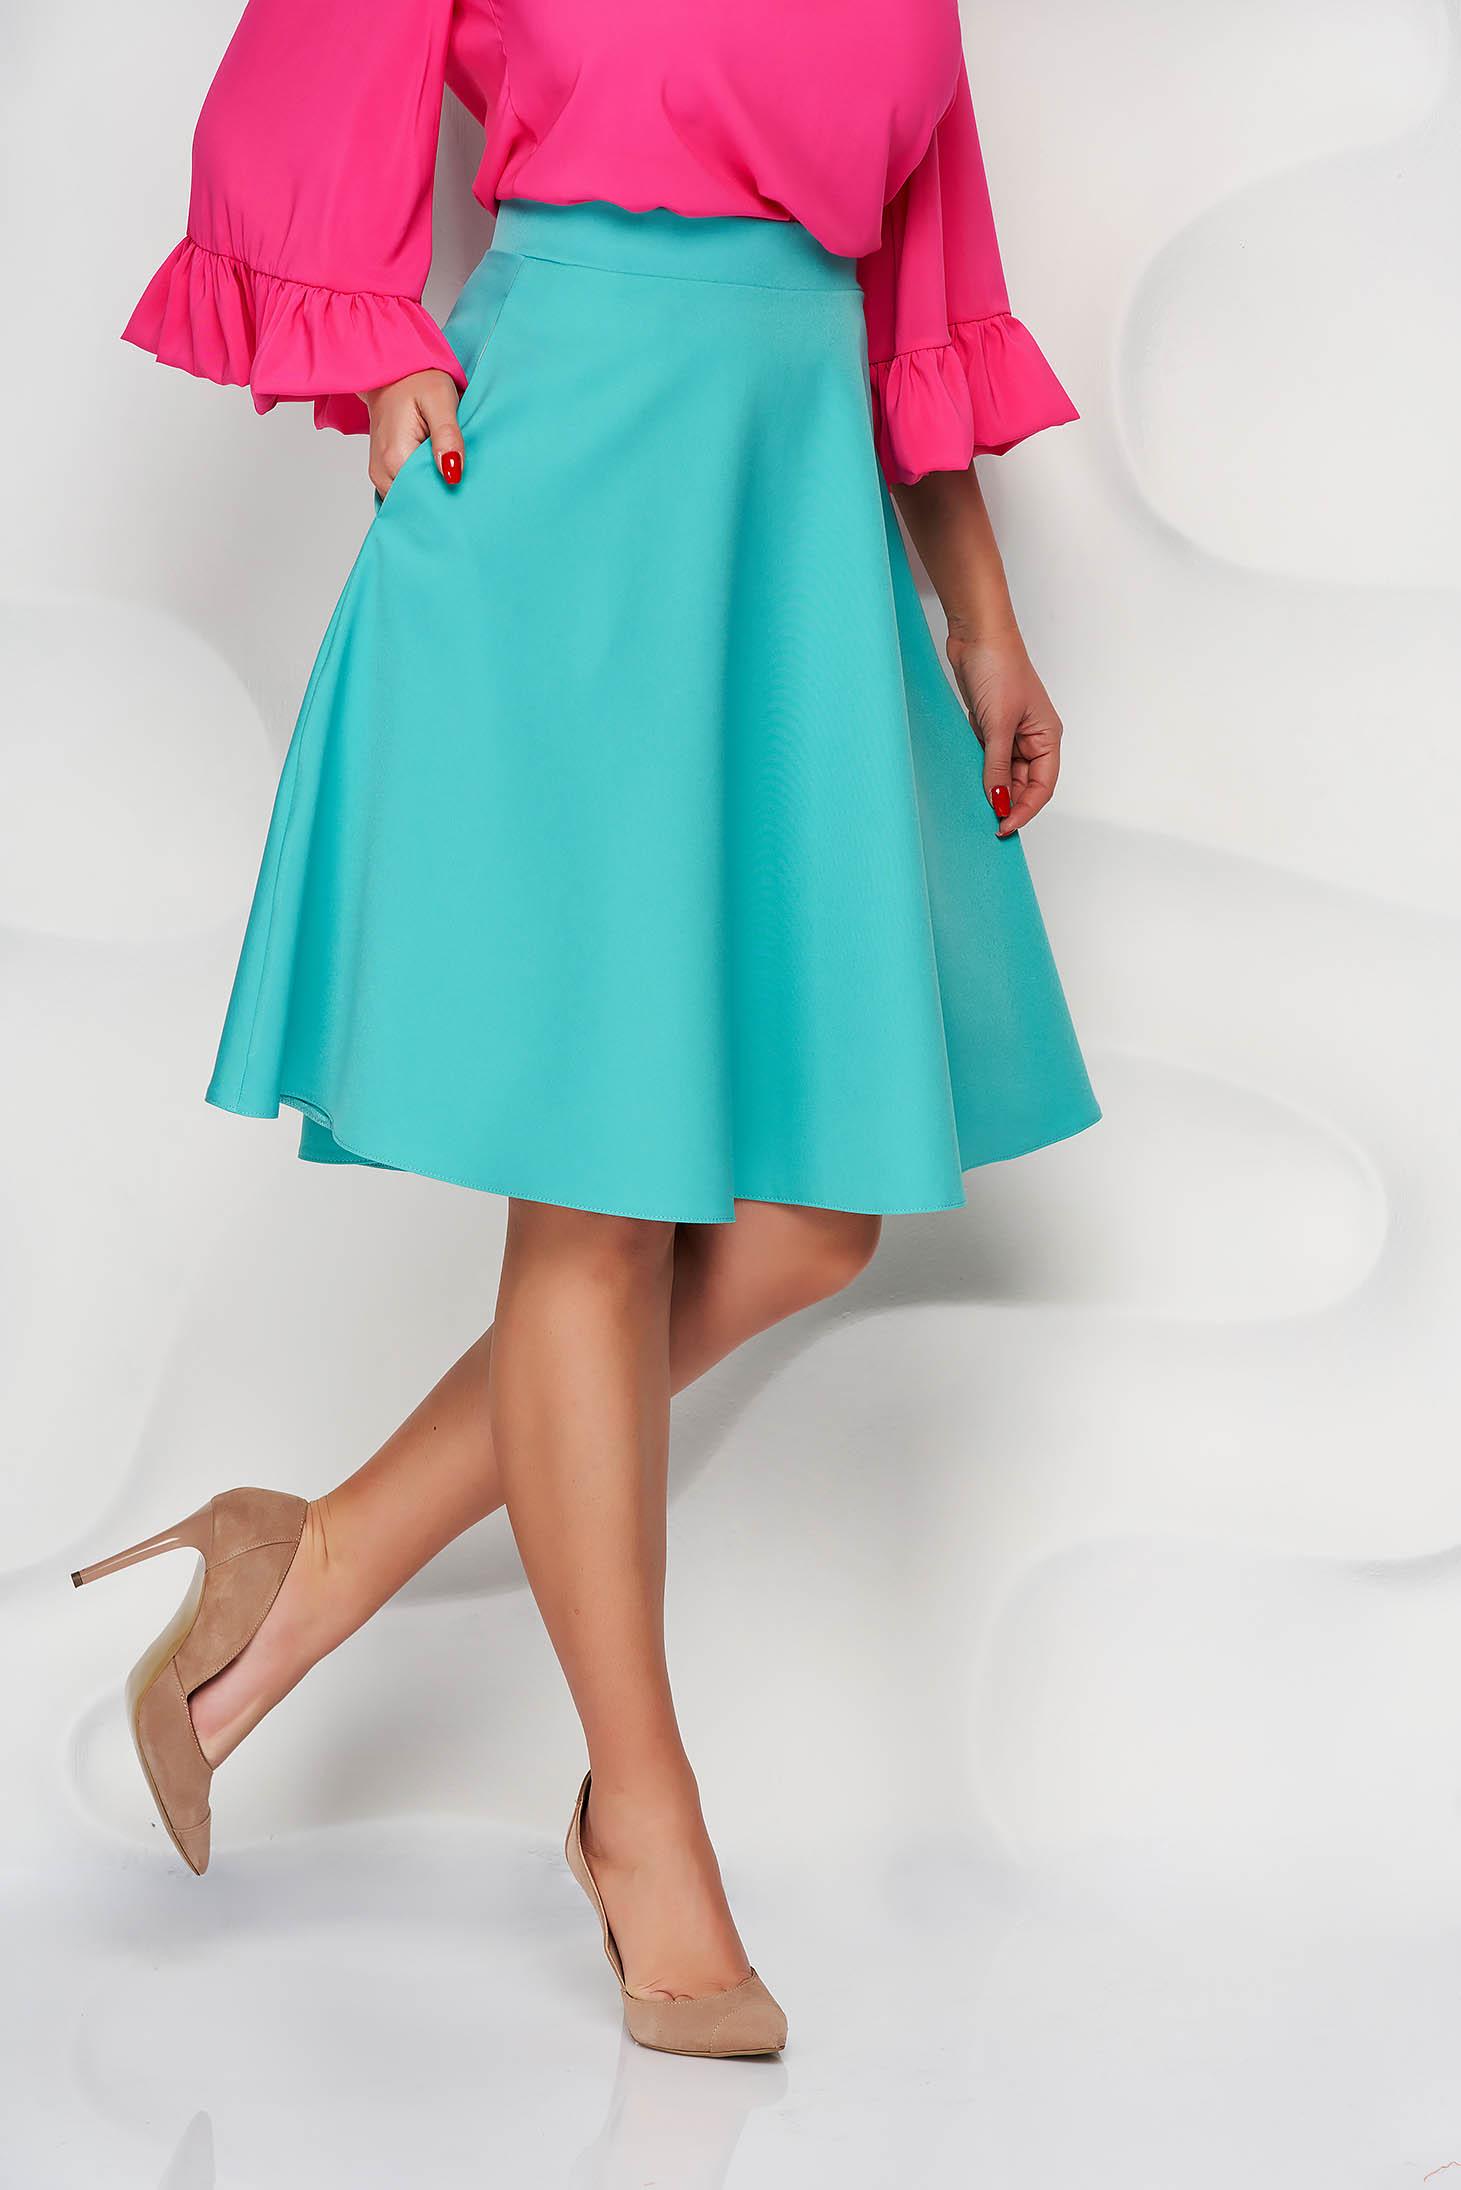 StarShinerS green elegant cloche skirt high waisted slightly elastic fabric office